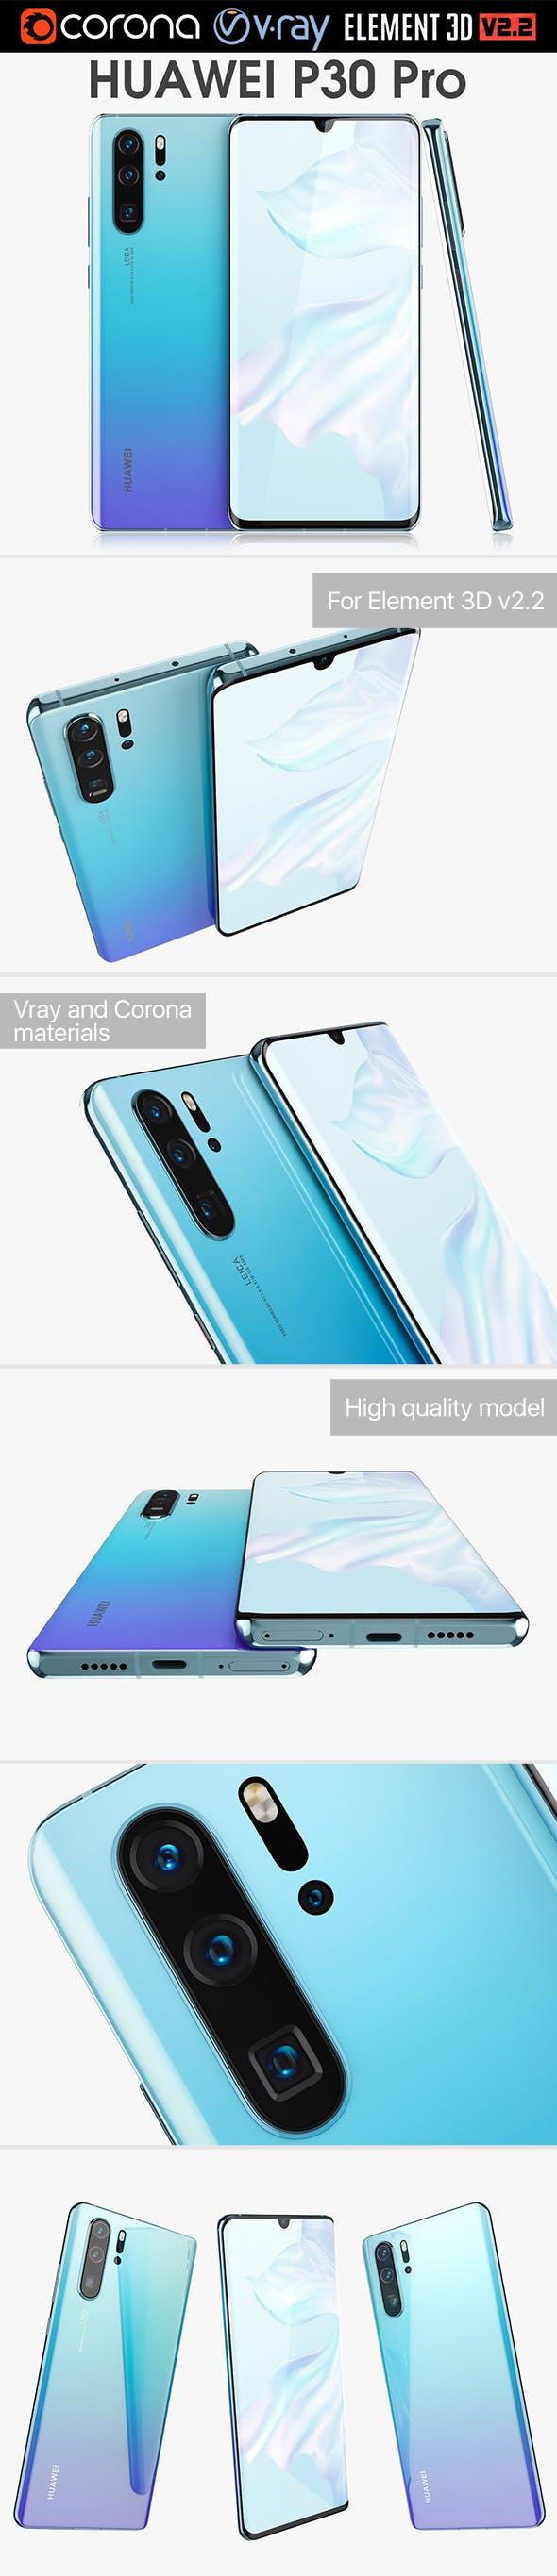 Huawei P30 Pro Breathing Crystal - 3DOcean Item for Sale